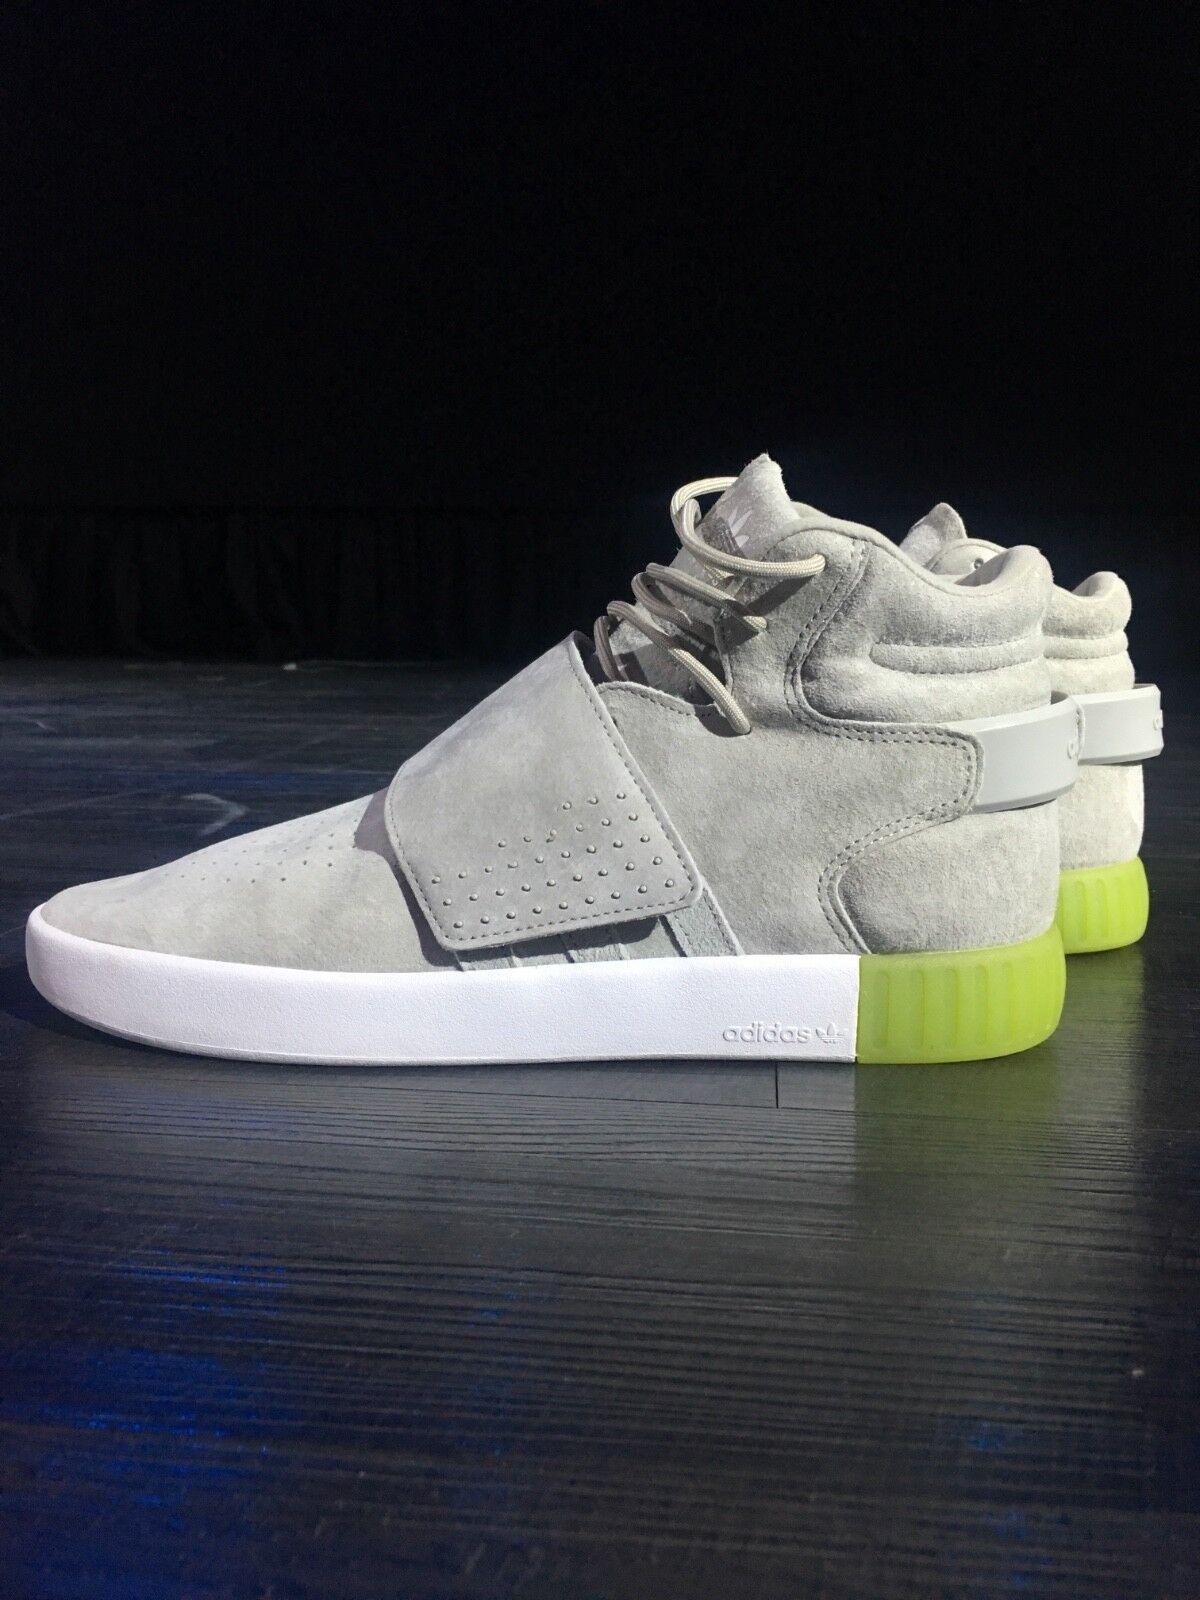 addidas Tubular Invader Strap, NEW,never worn, grey, size 10, tags still on